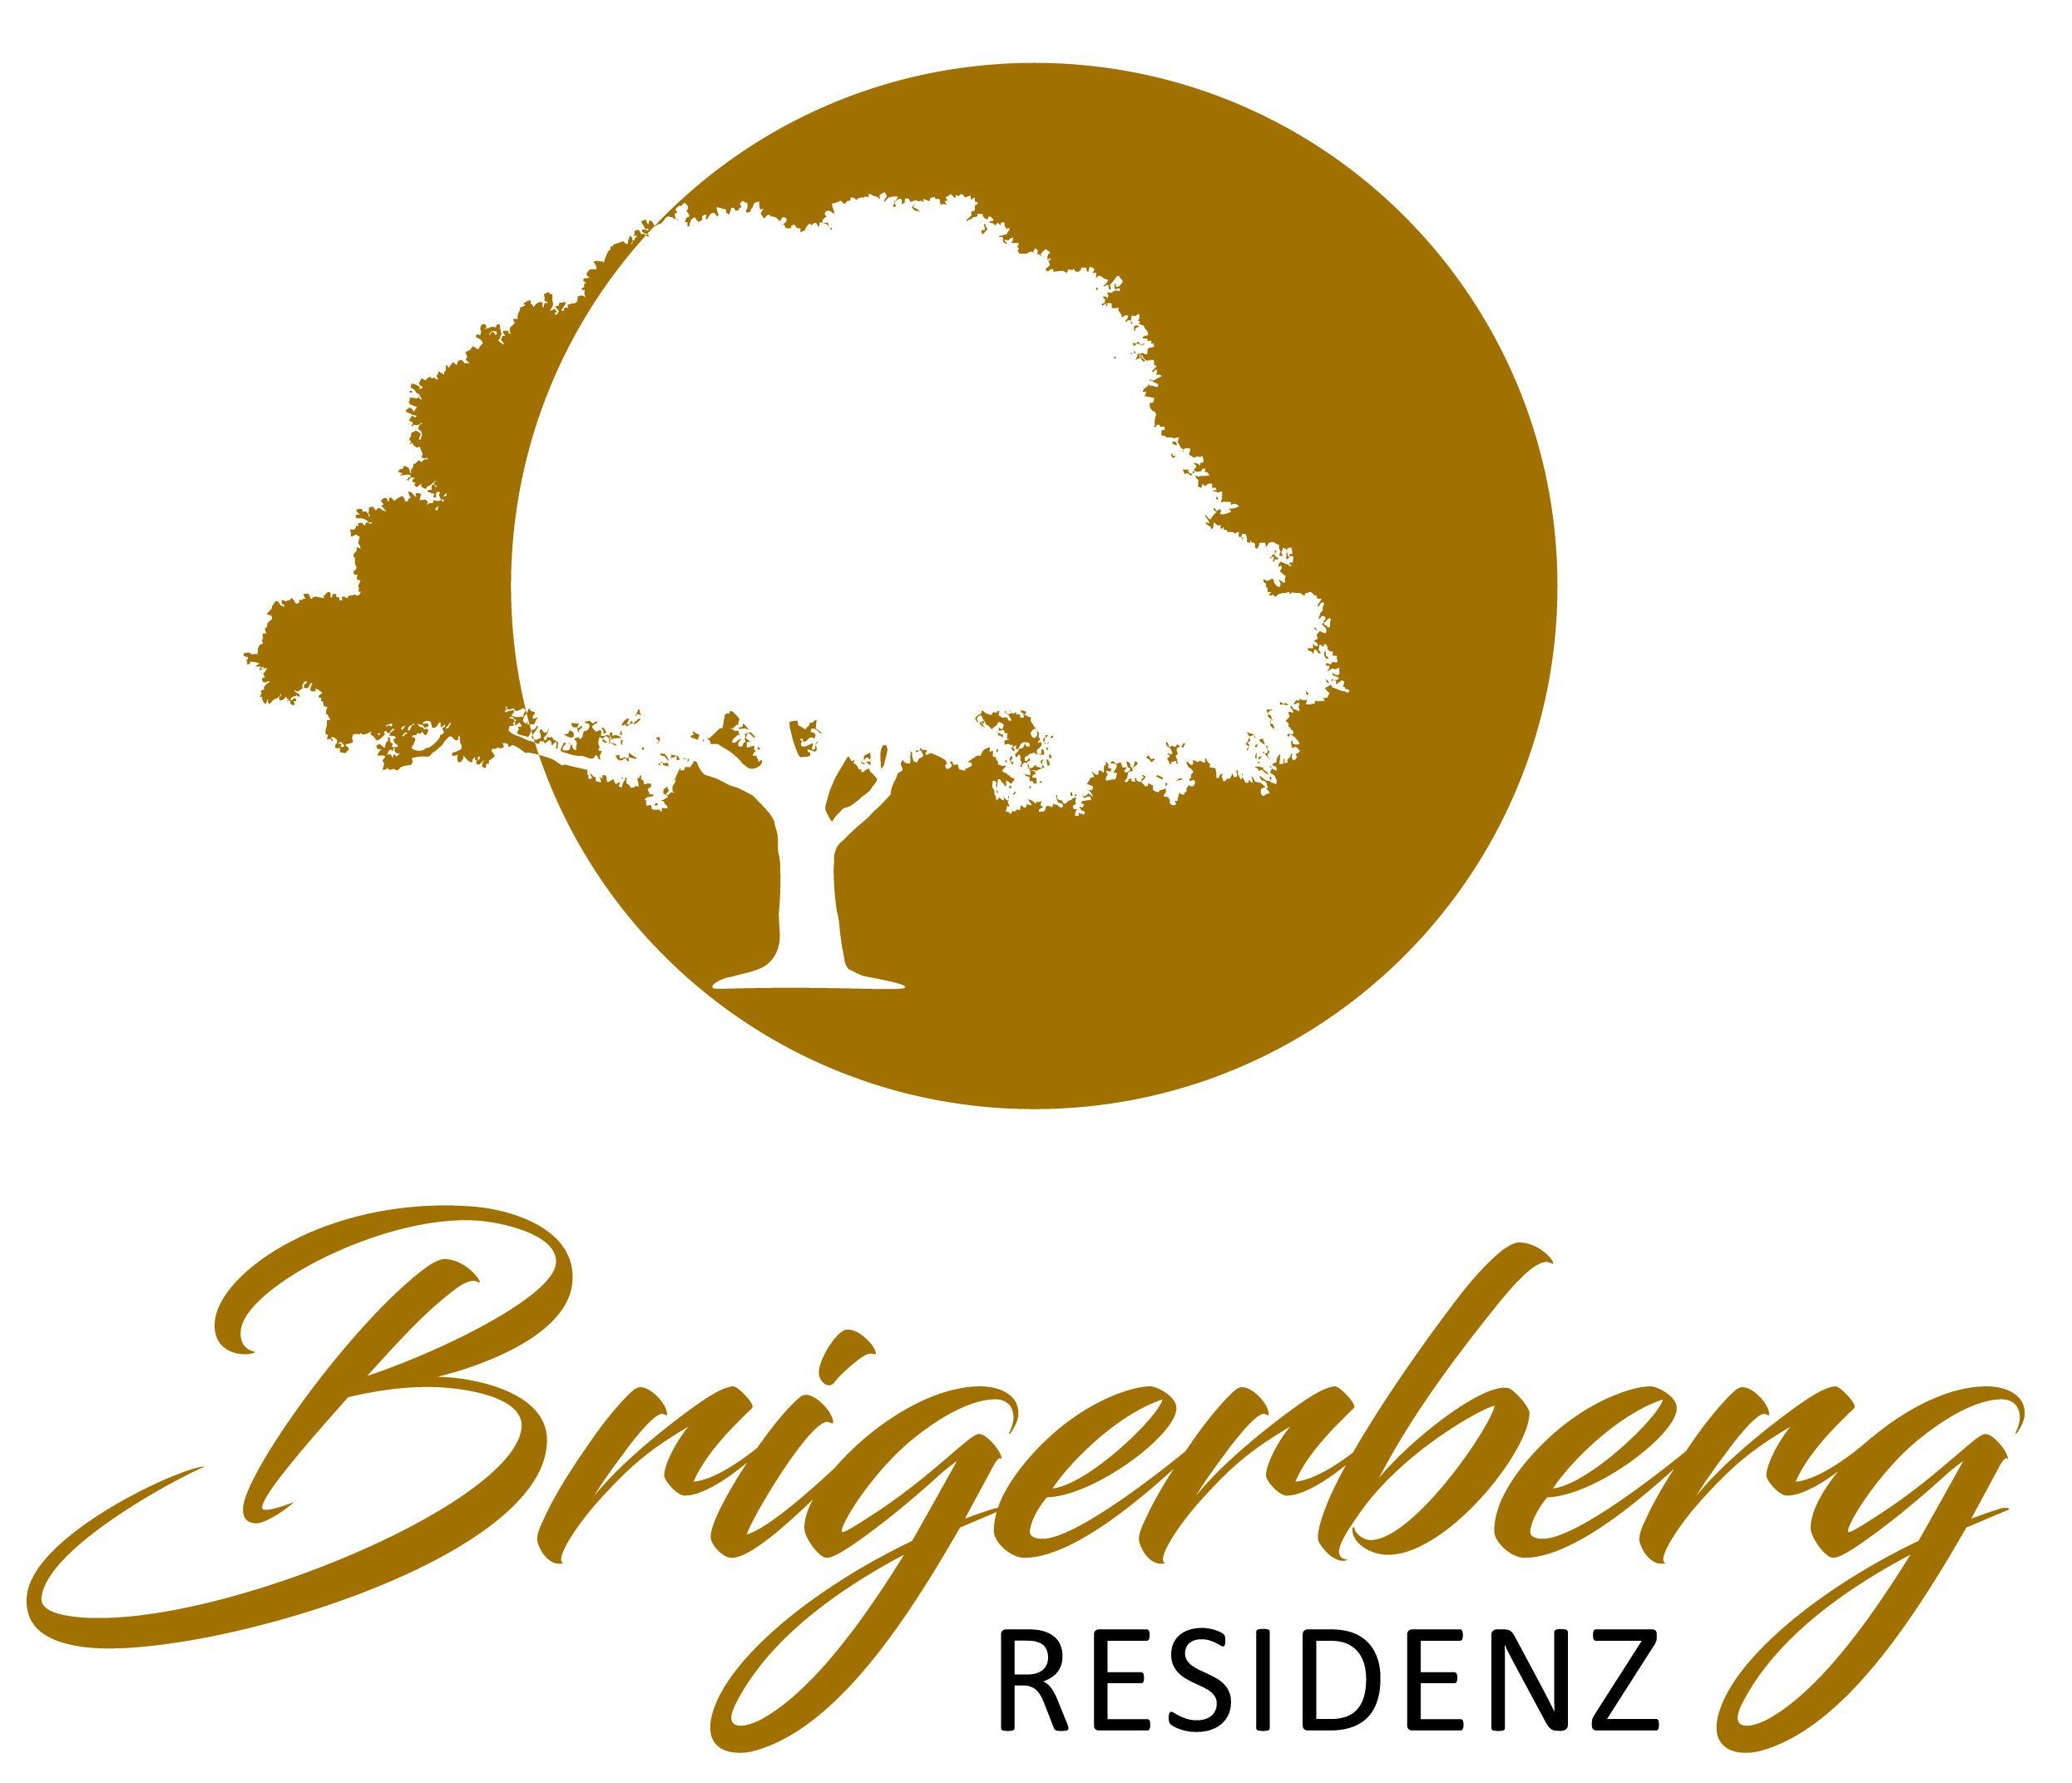 Stiftung Residenz Brigerberg